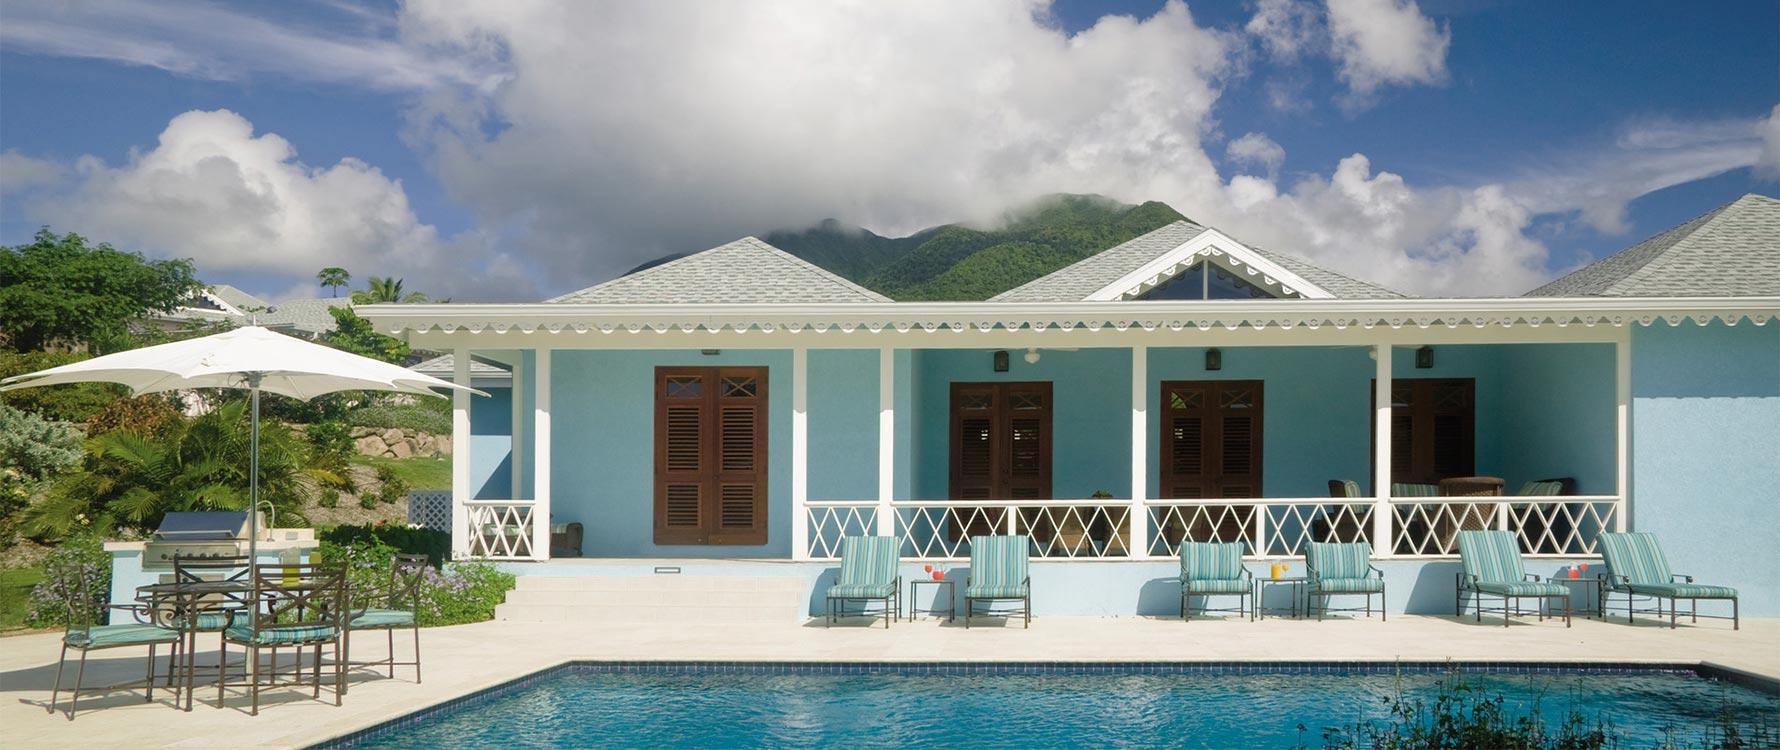 View from pool Nevis peak in backdrop